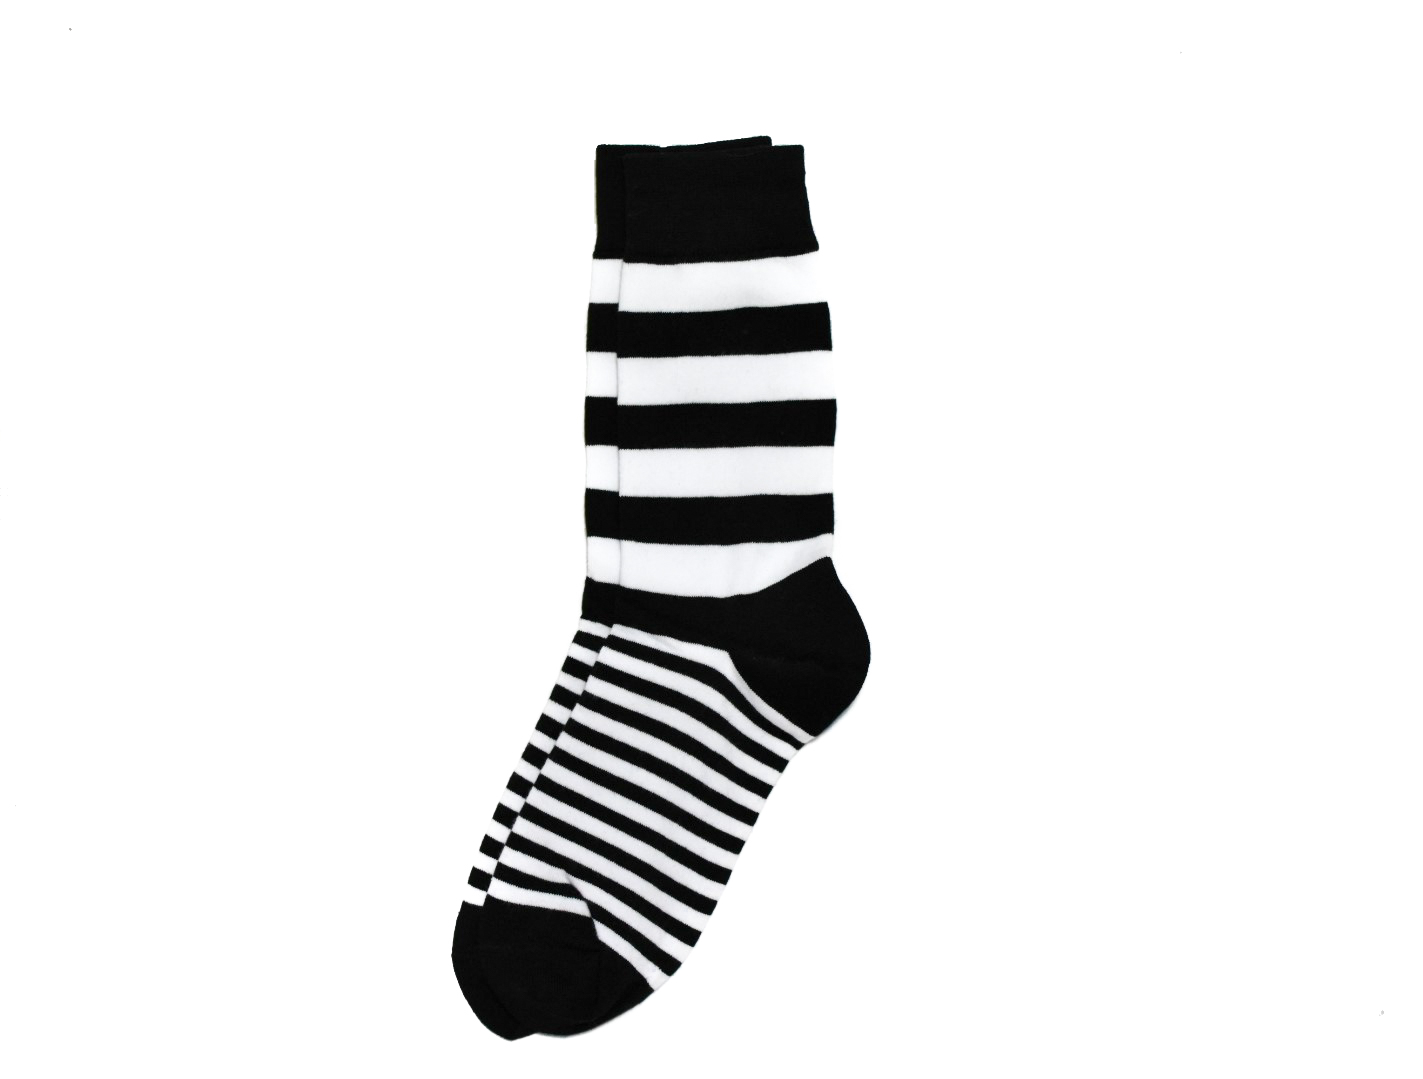 Juijitsu Socks